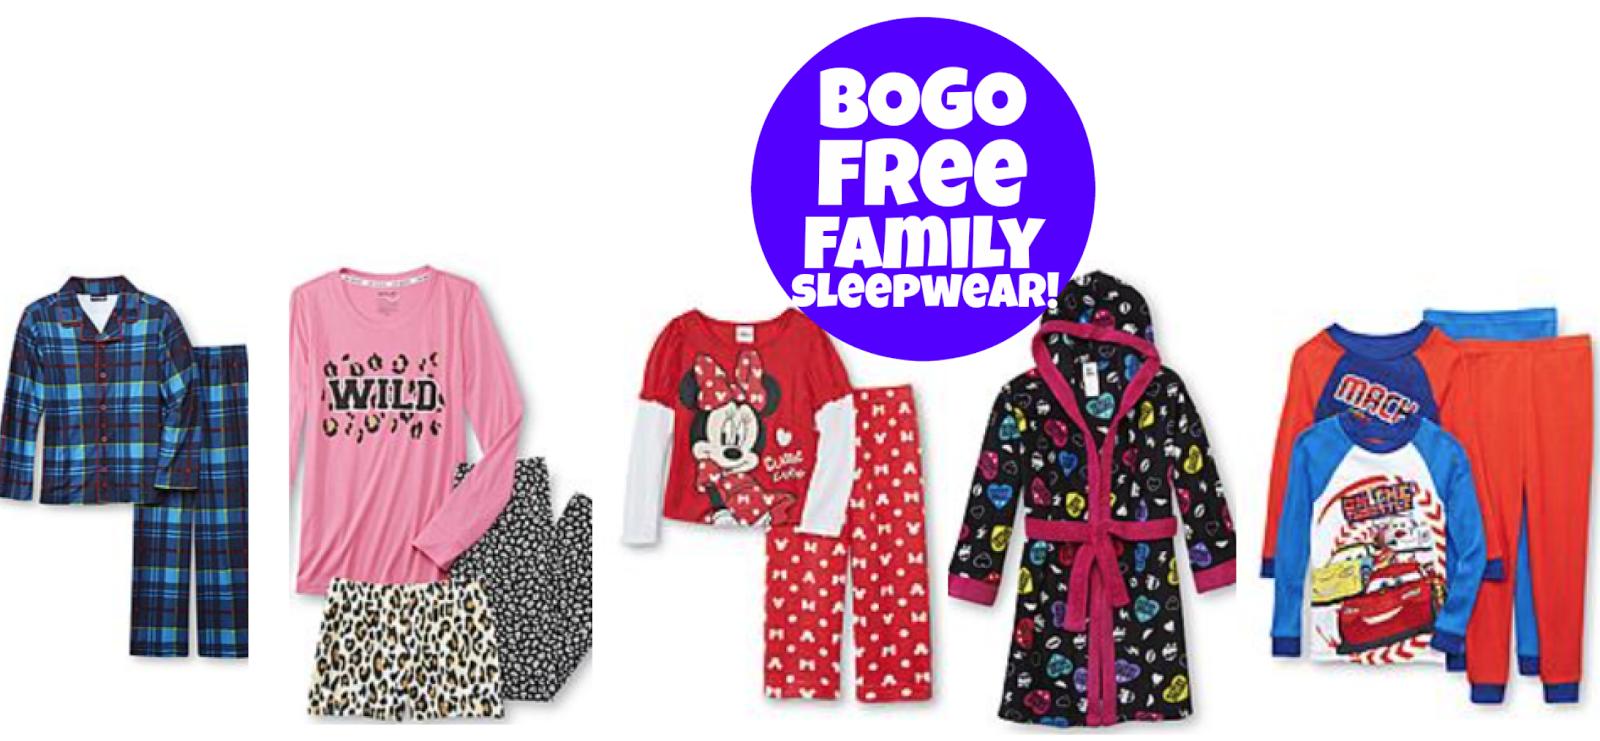 http://www.thebinderladies.com/2014/12/kmart-buy-1-get-1-free-sleepwear-for.html#.VJR20AAIA